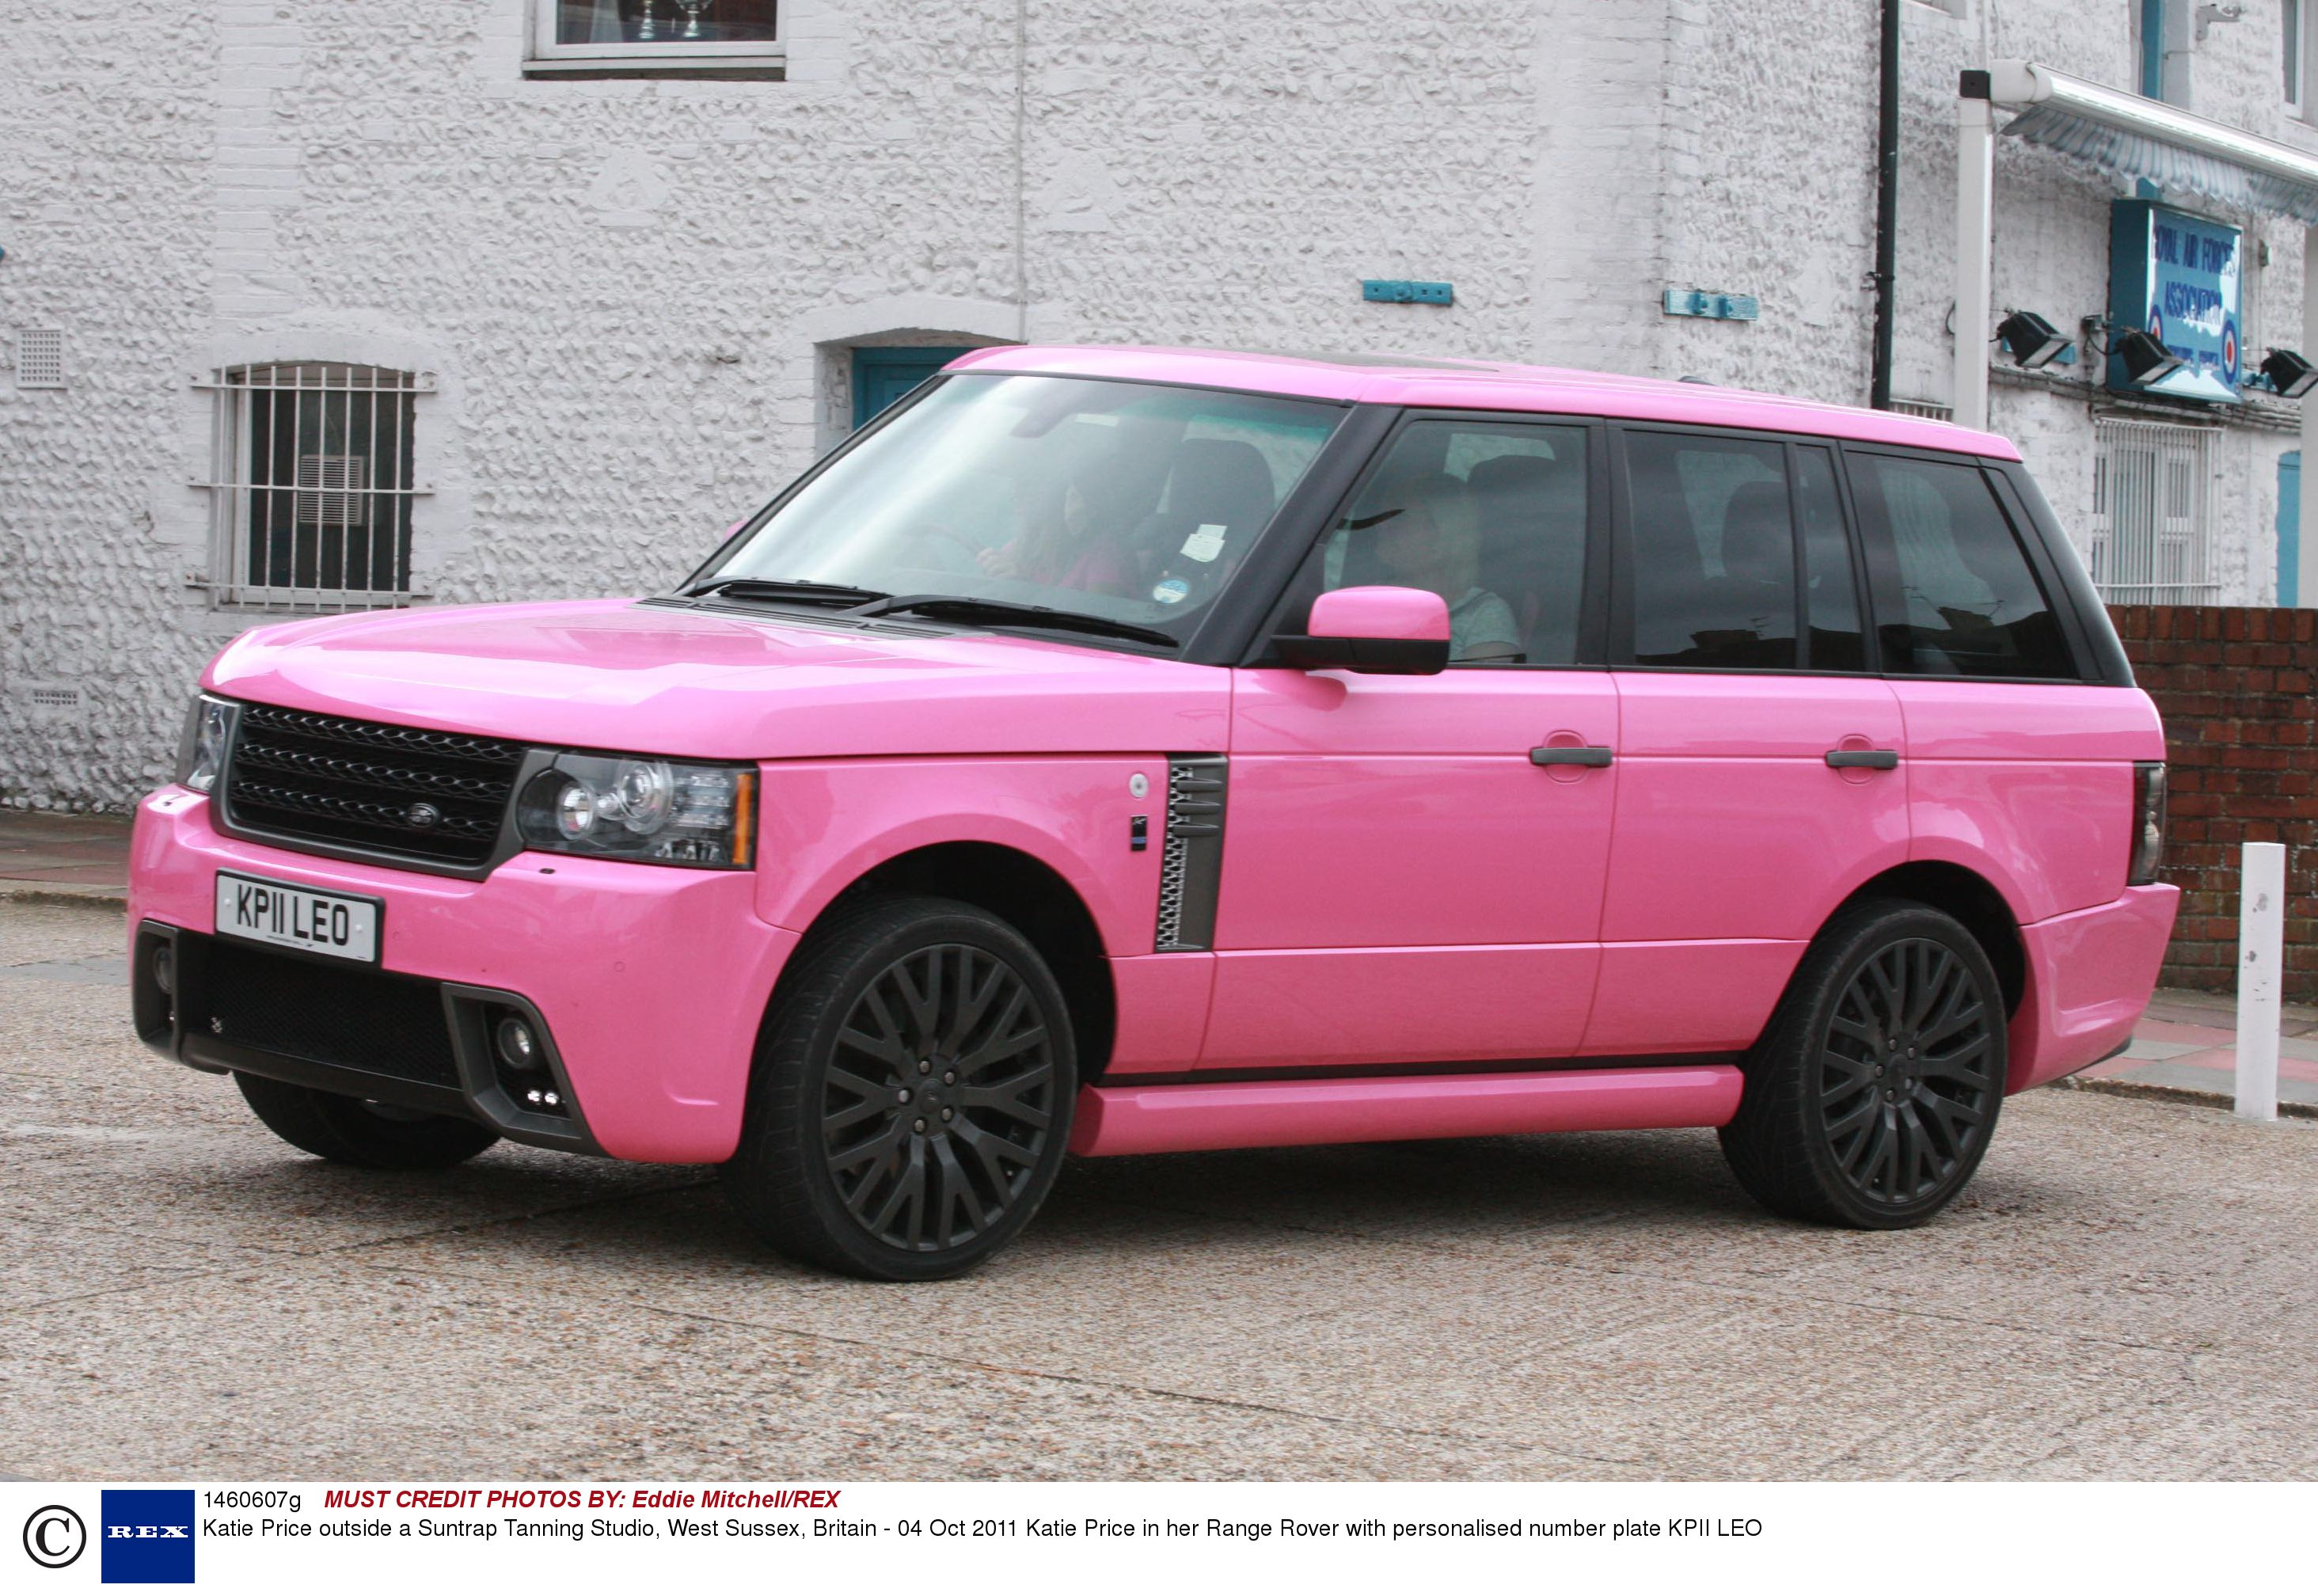 katie price puts pink custom made range rover up for sale. Black Bedroom Furniture Sets. Home Design Ideas